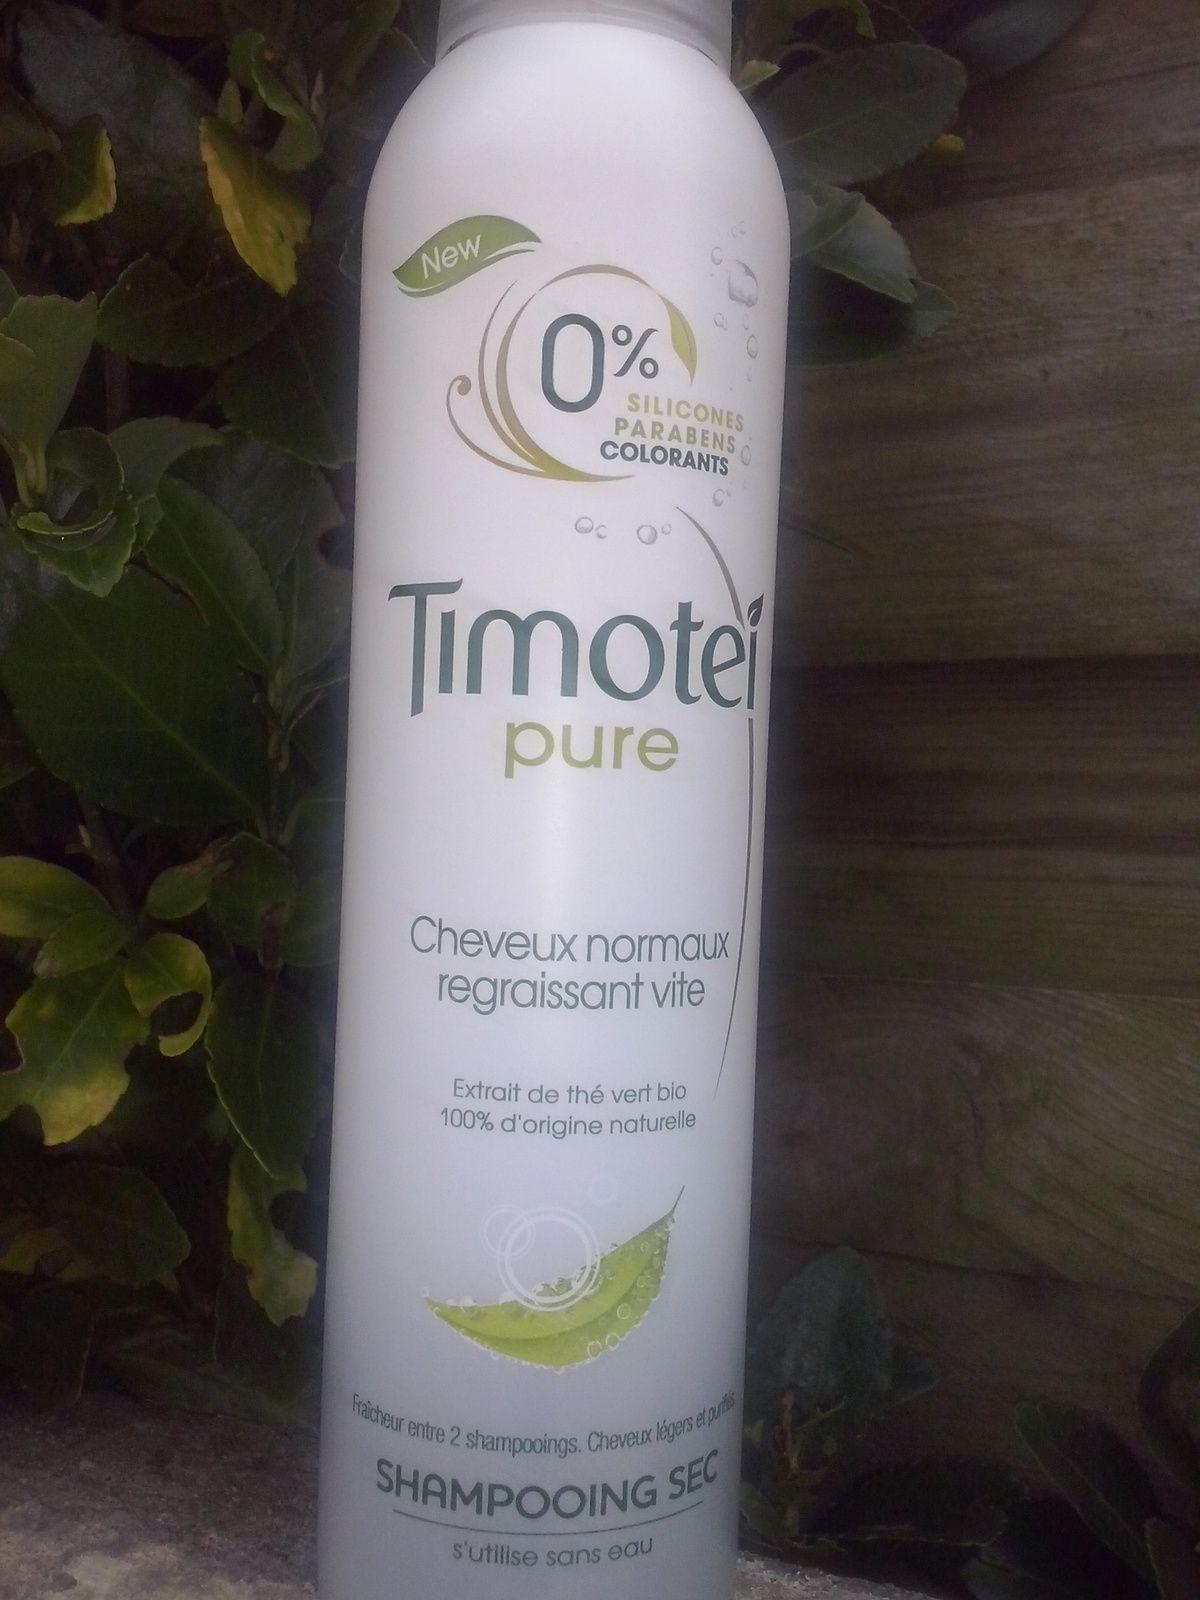 pour les matins express,timotei shampoing sec